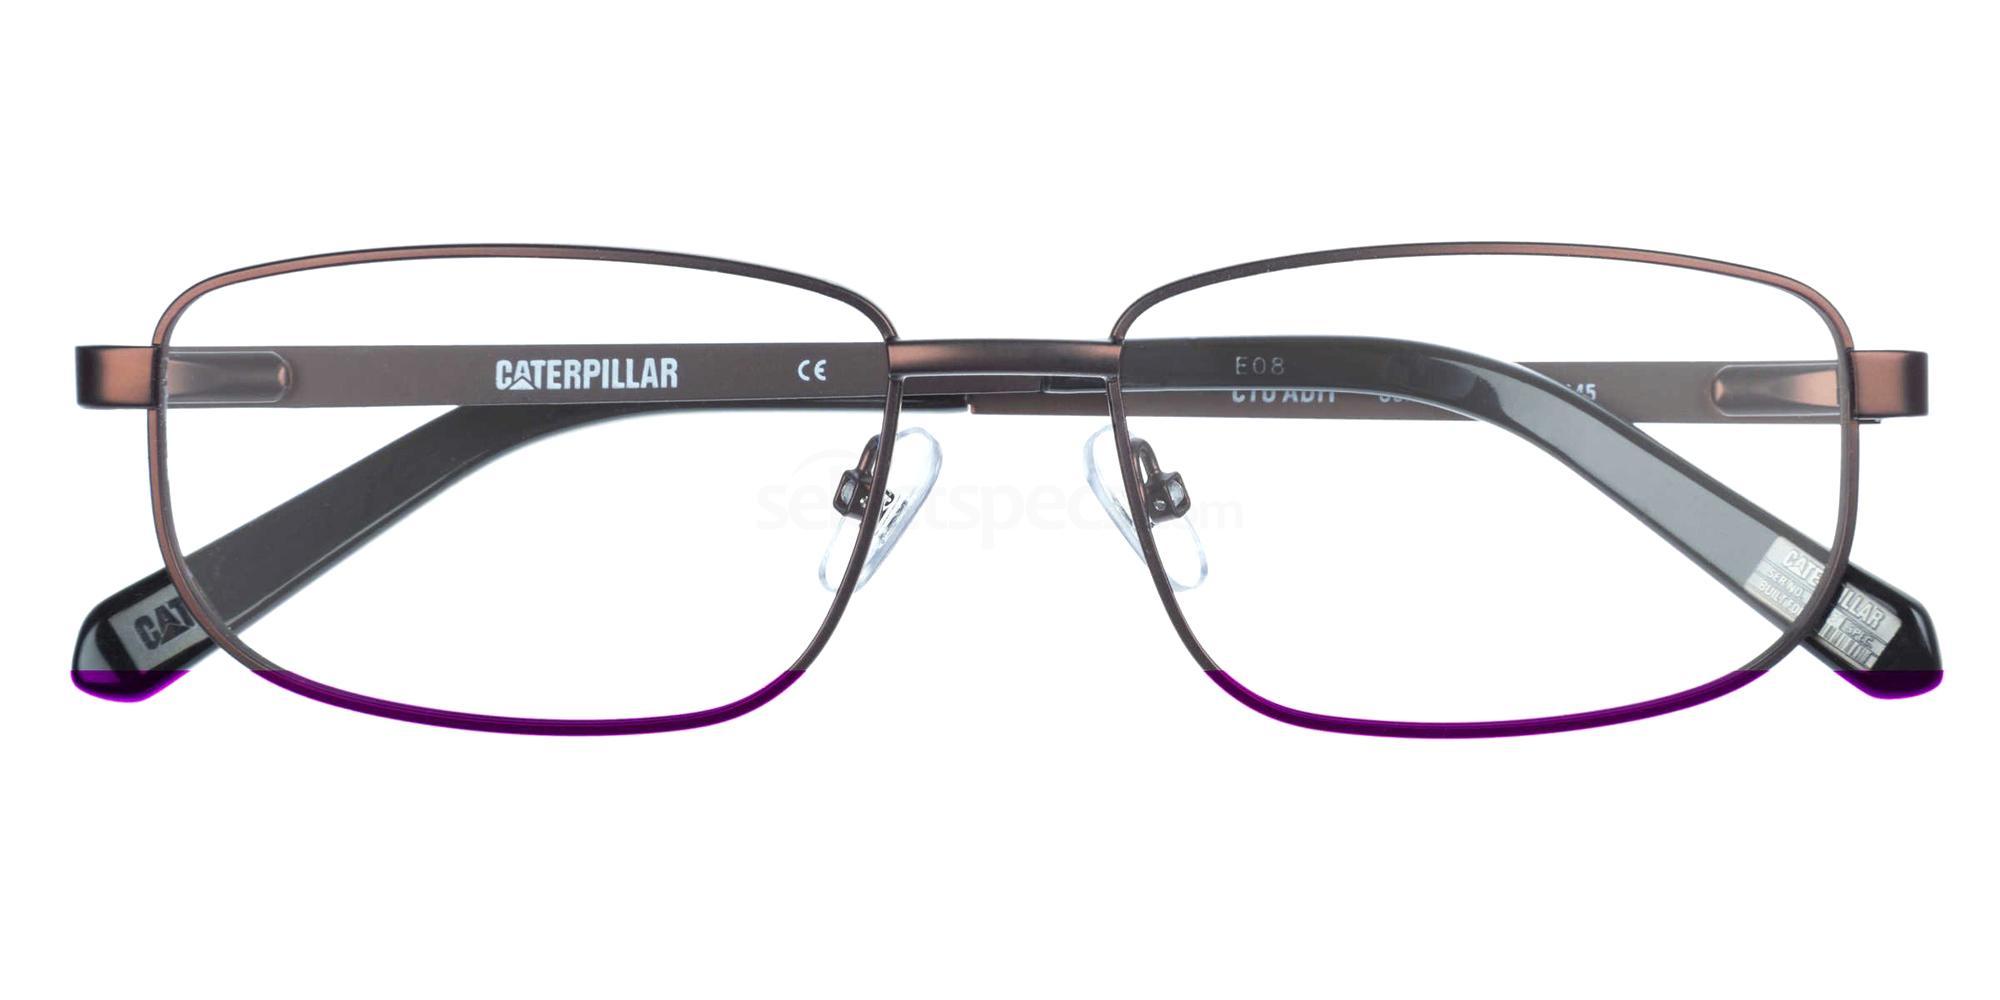 003 CTO-ADIT Glasses, CAT